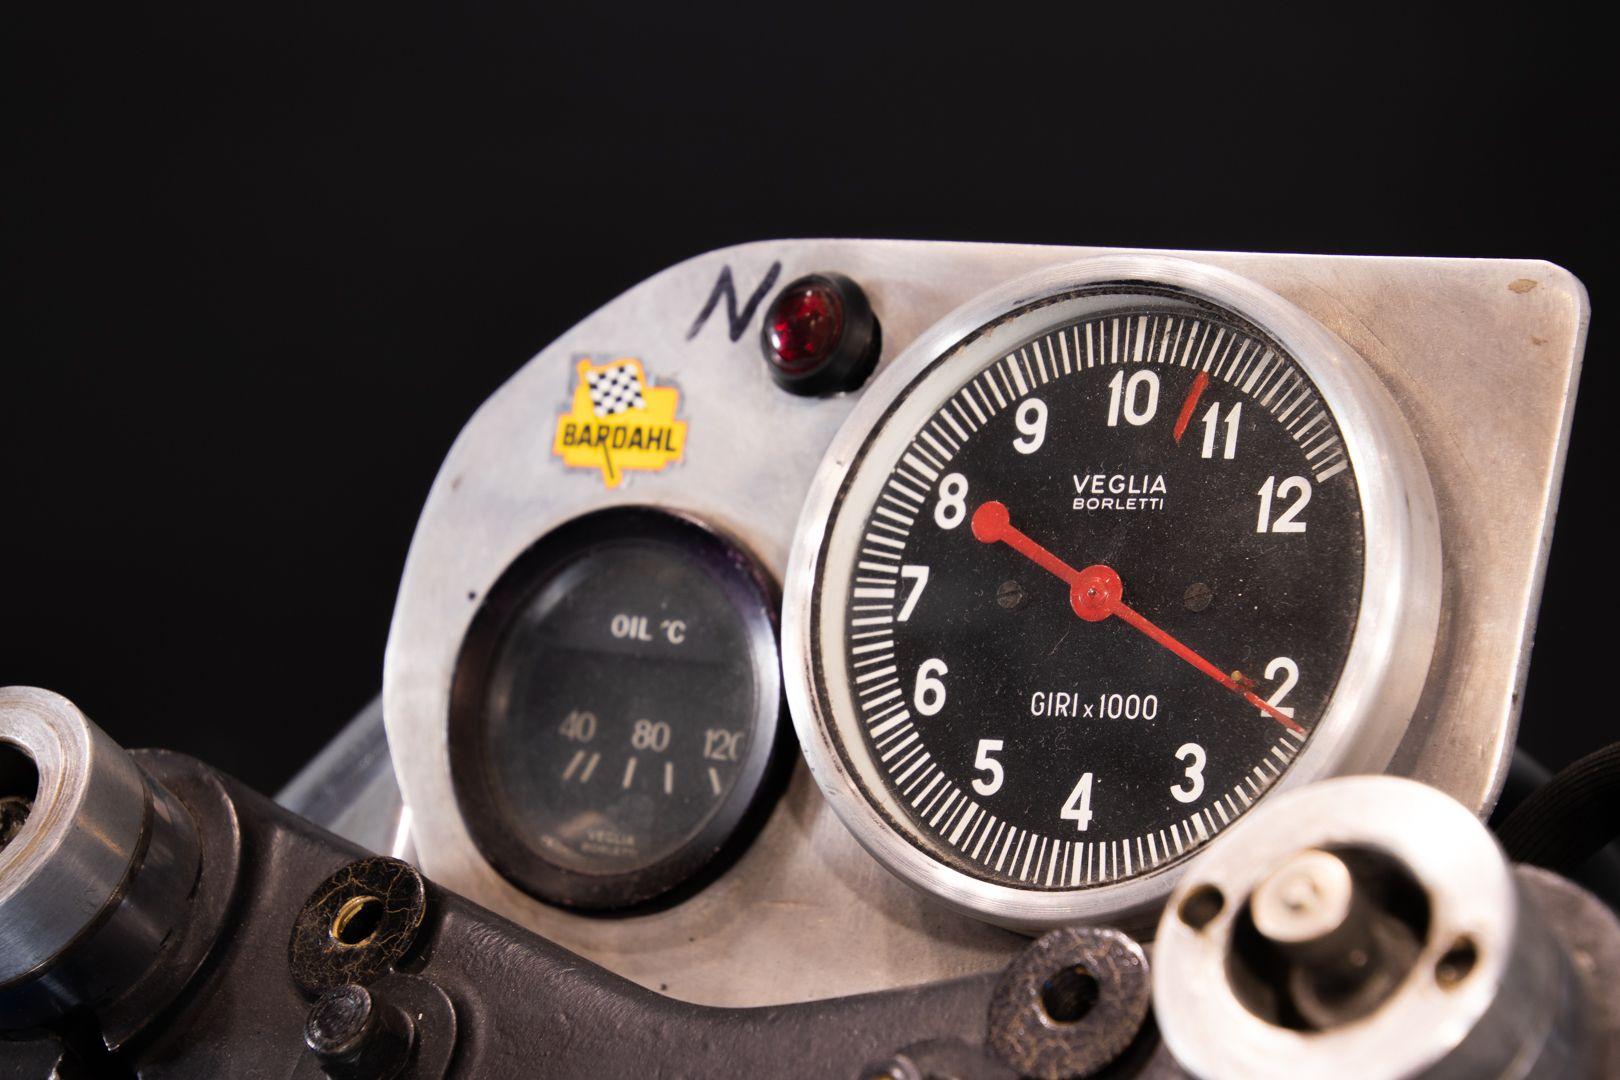 1980 Kawasaki Segoni 900 Testa Nera 74921